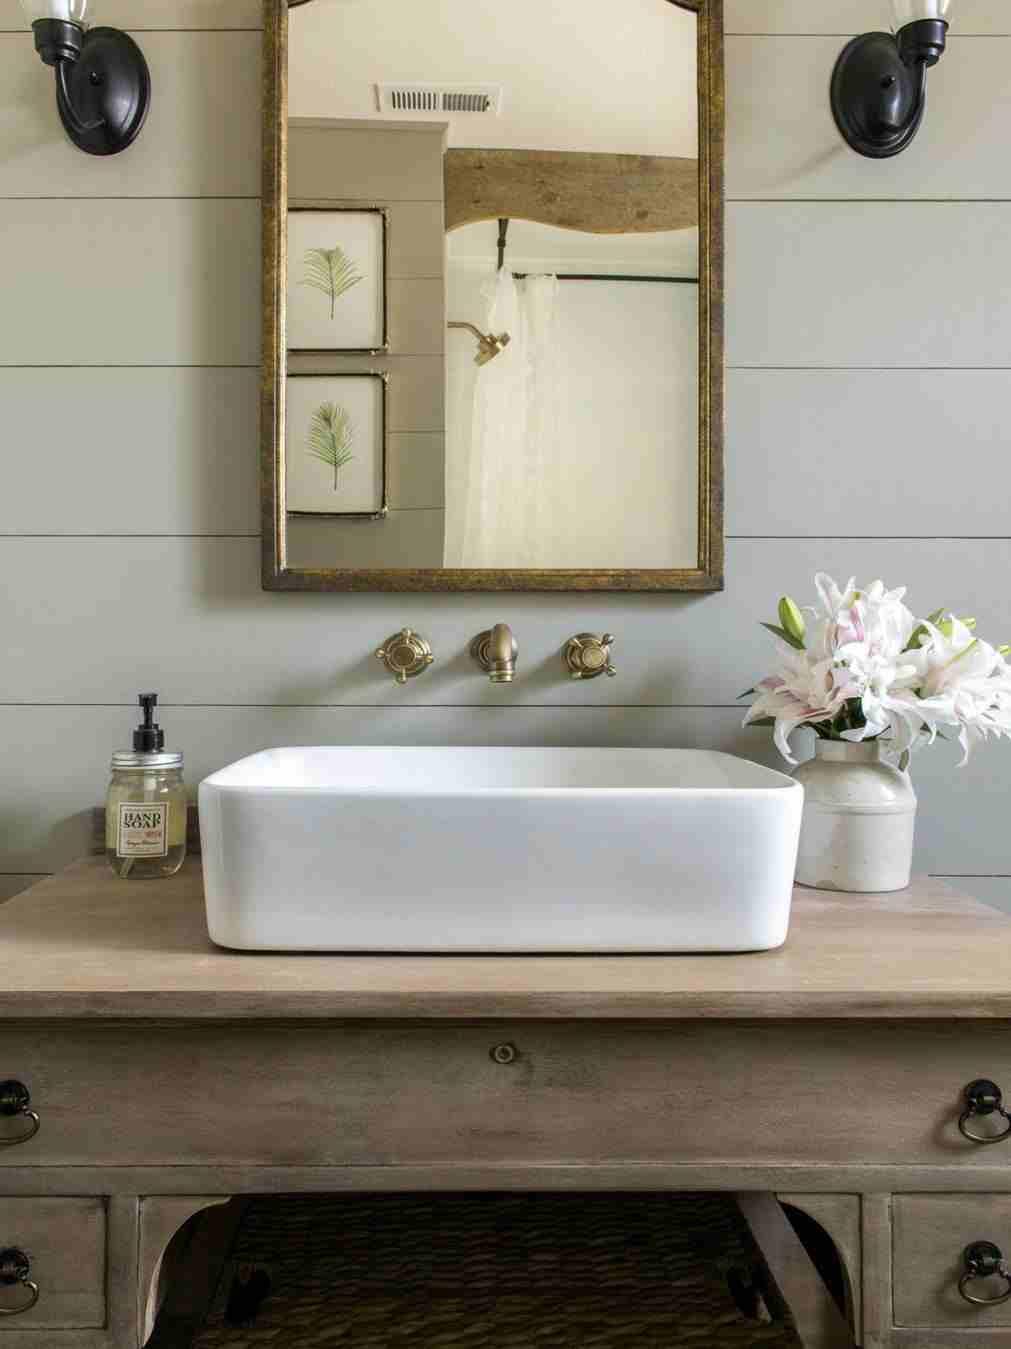 antique bathroom vanity with vessel sink vessel sink awesome rhiideacom picture antique bathroom vanity of with vessel  sink HPILSSS